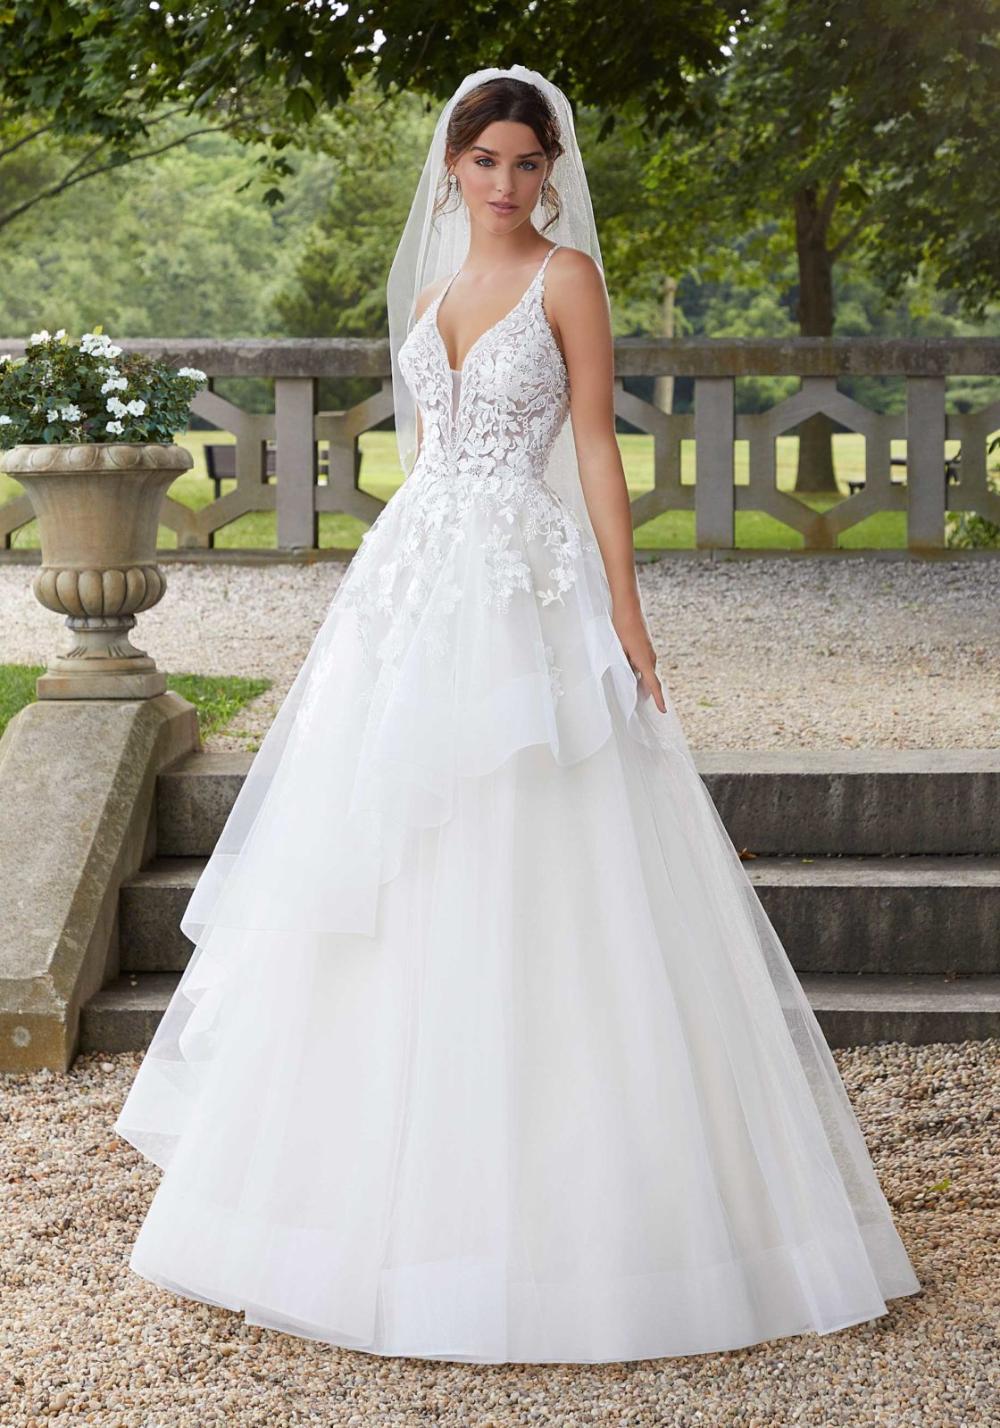 Sahara Wedding Dress   Morilee   Wedding dresses, A line wedding ...